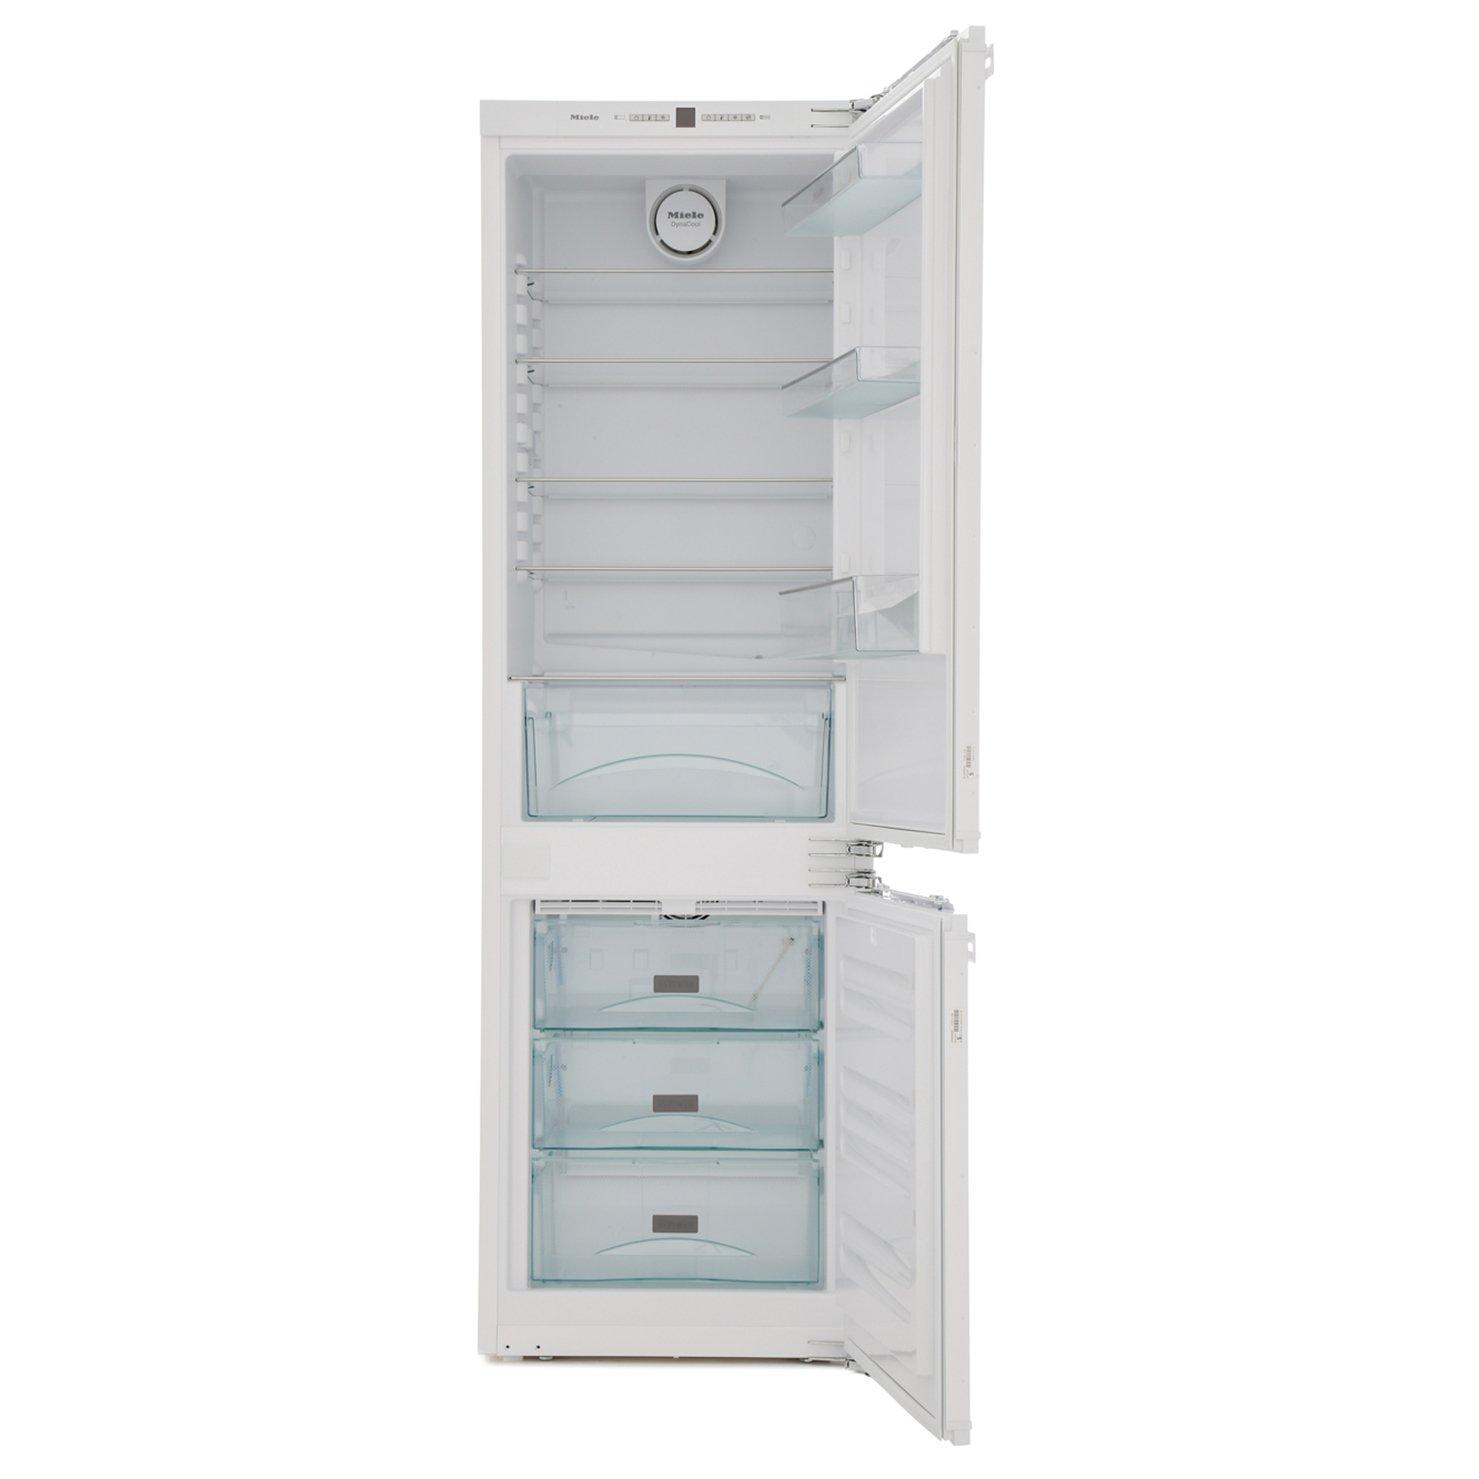 Miele KFN 37232 iD Frost Free Integrated Fridge Freezer